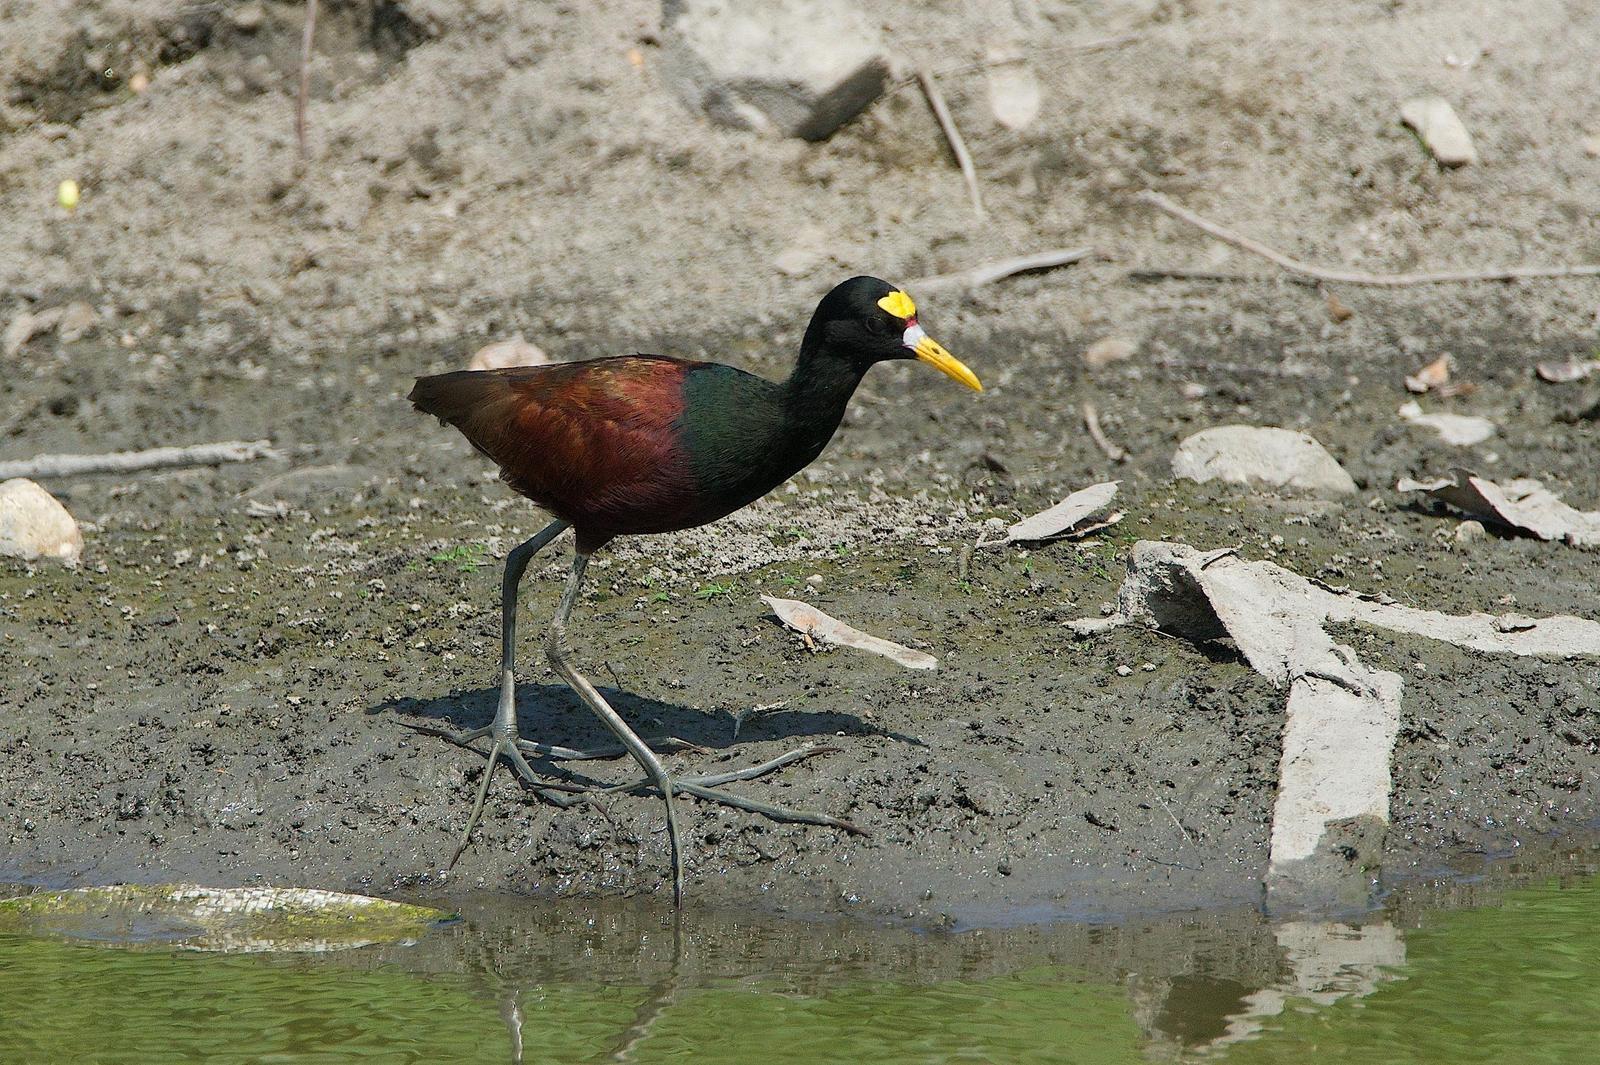 Northern Jacana Photo by Gerald Hoekstra